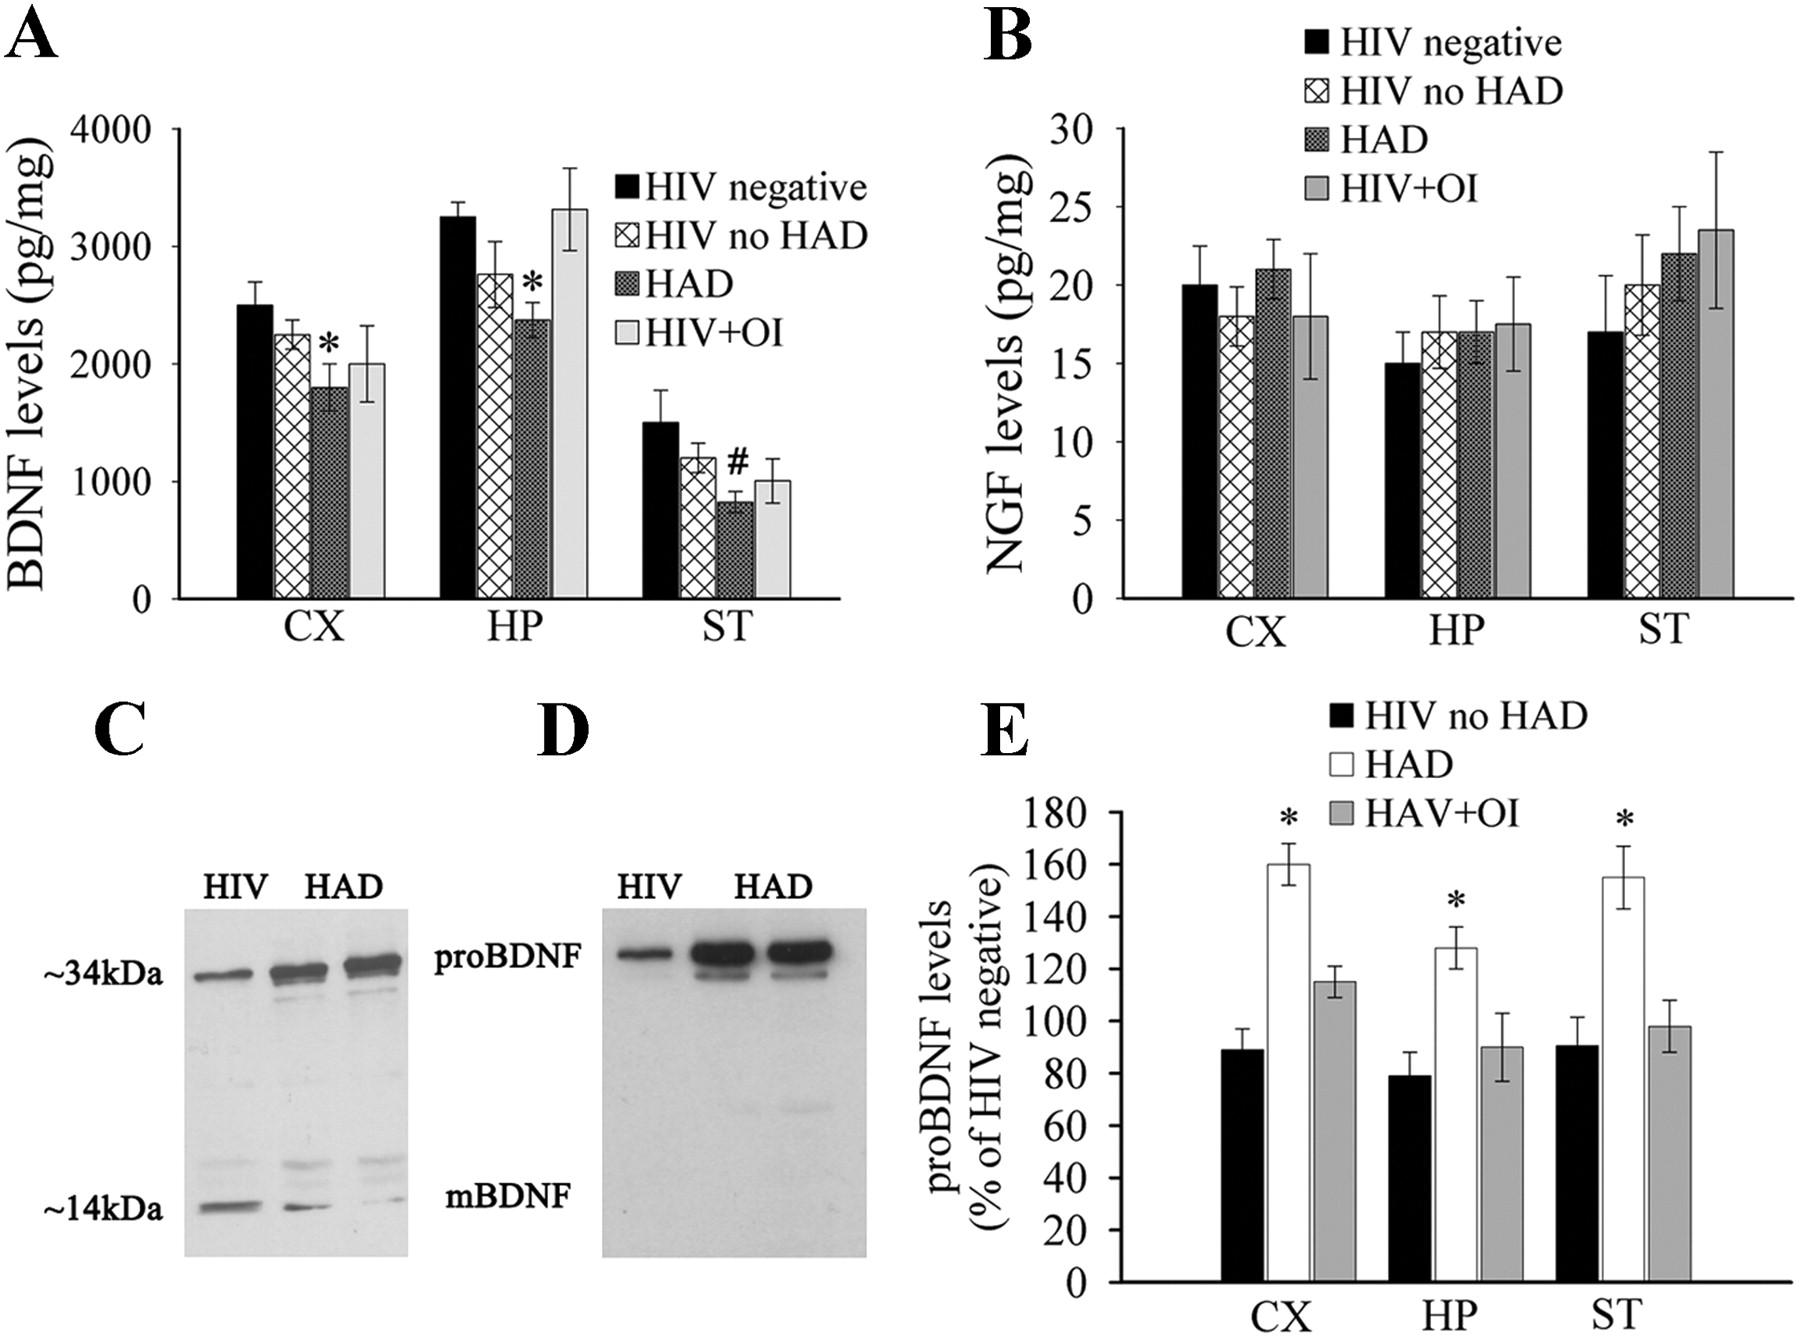 Human Immunodeficiency Virus Type 1 Alters Brain-Derived